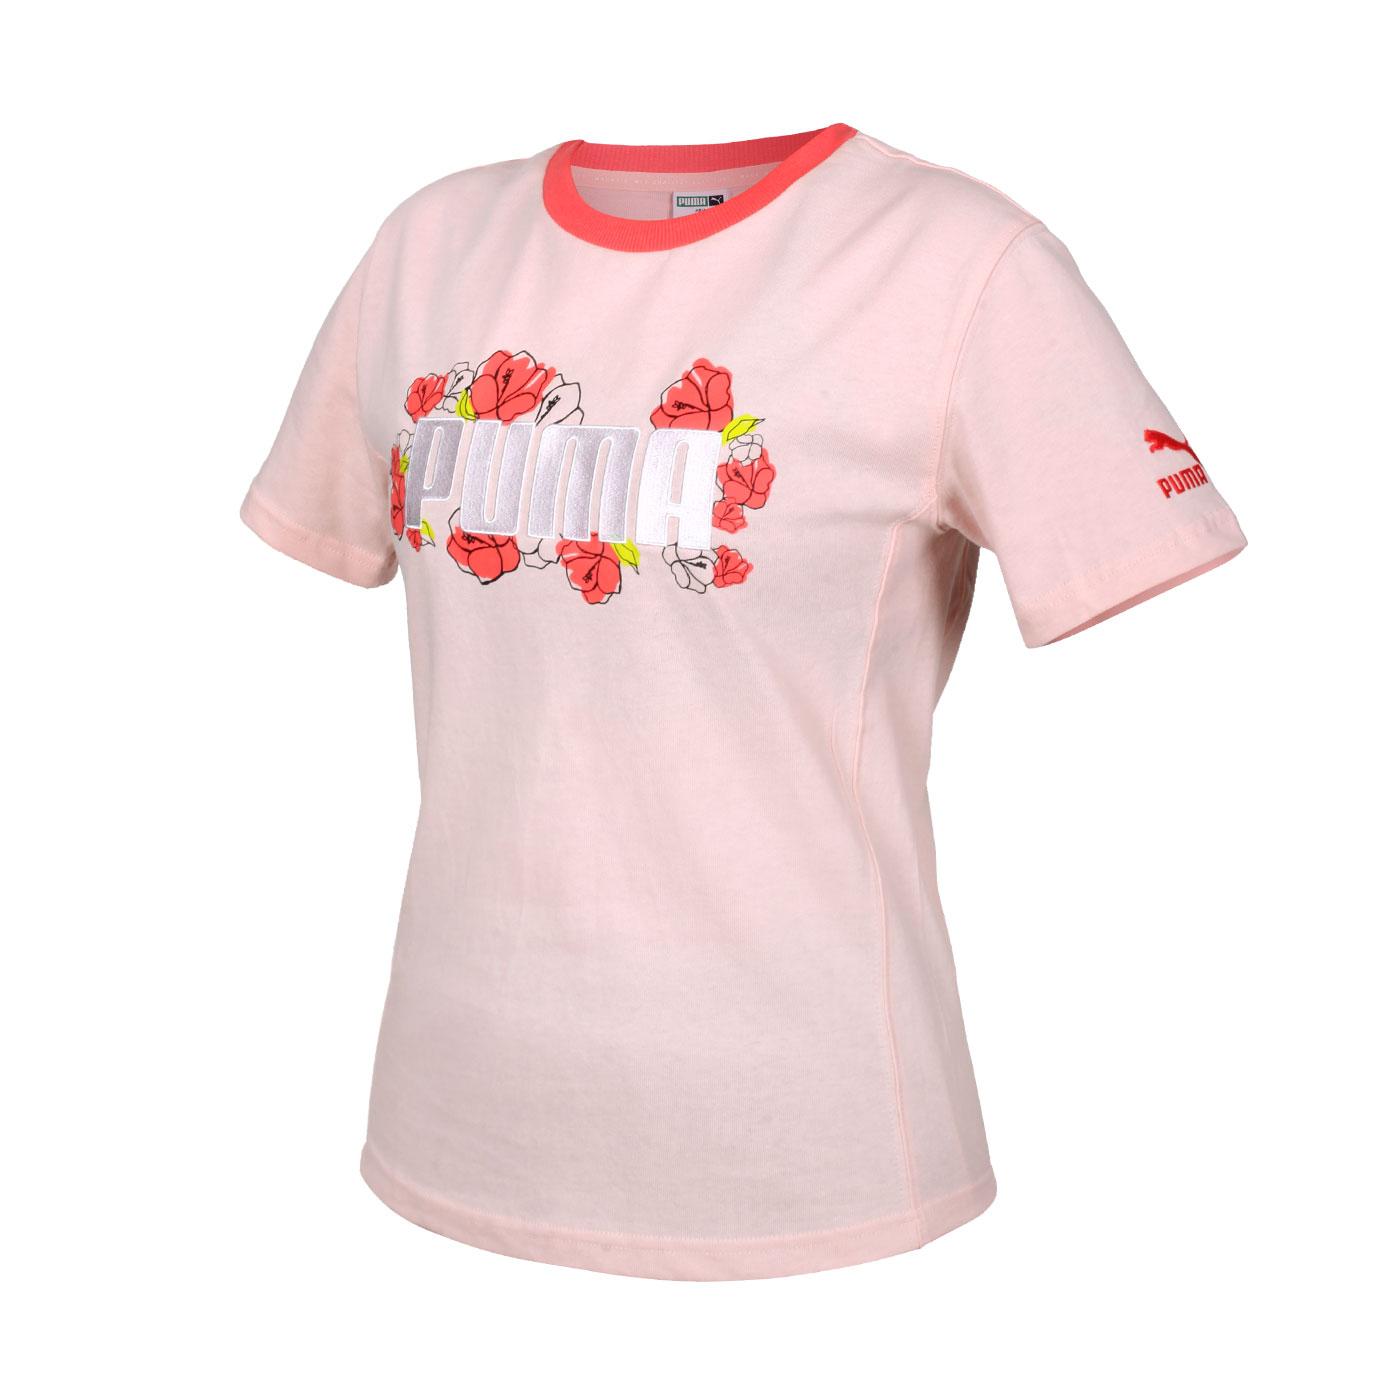 PUMA 女款Floral短袖T恤 53204227 - 粉紅綠白